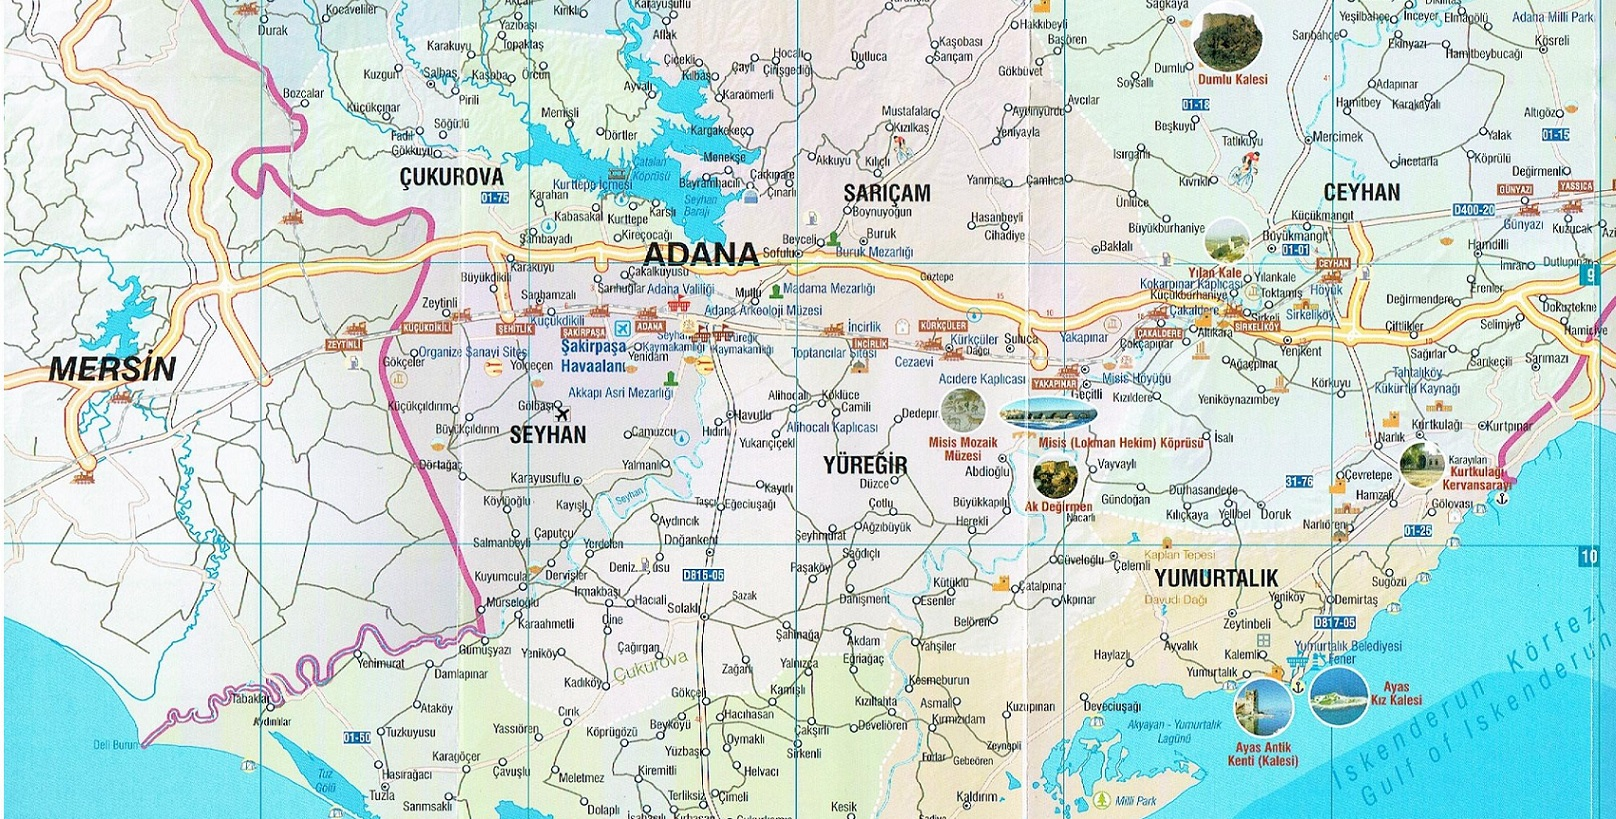 Adana Southern Turkey weepingredorger